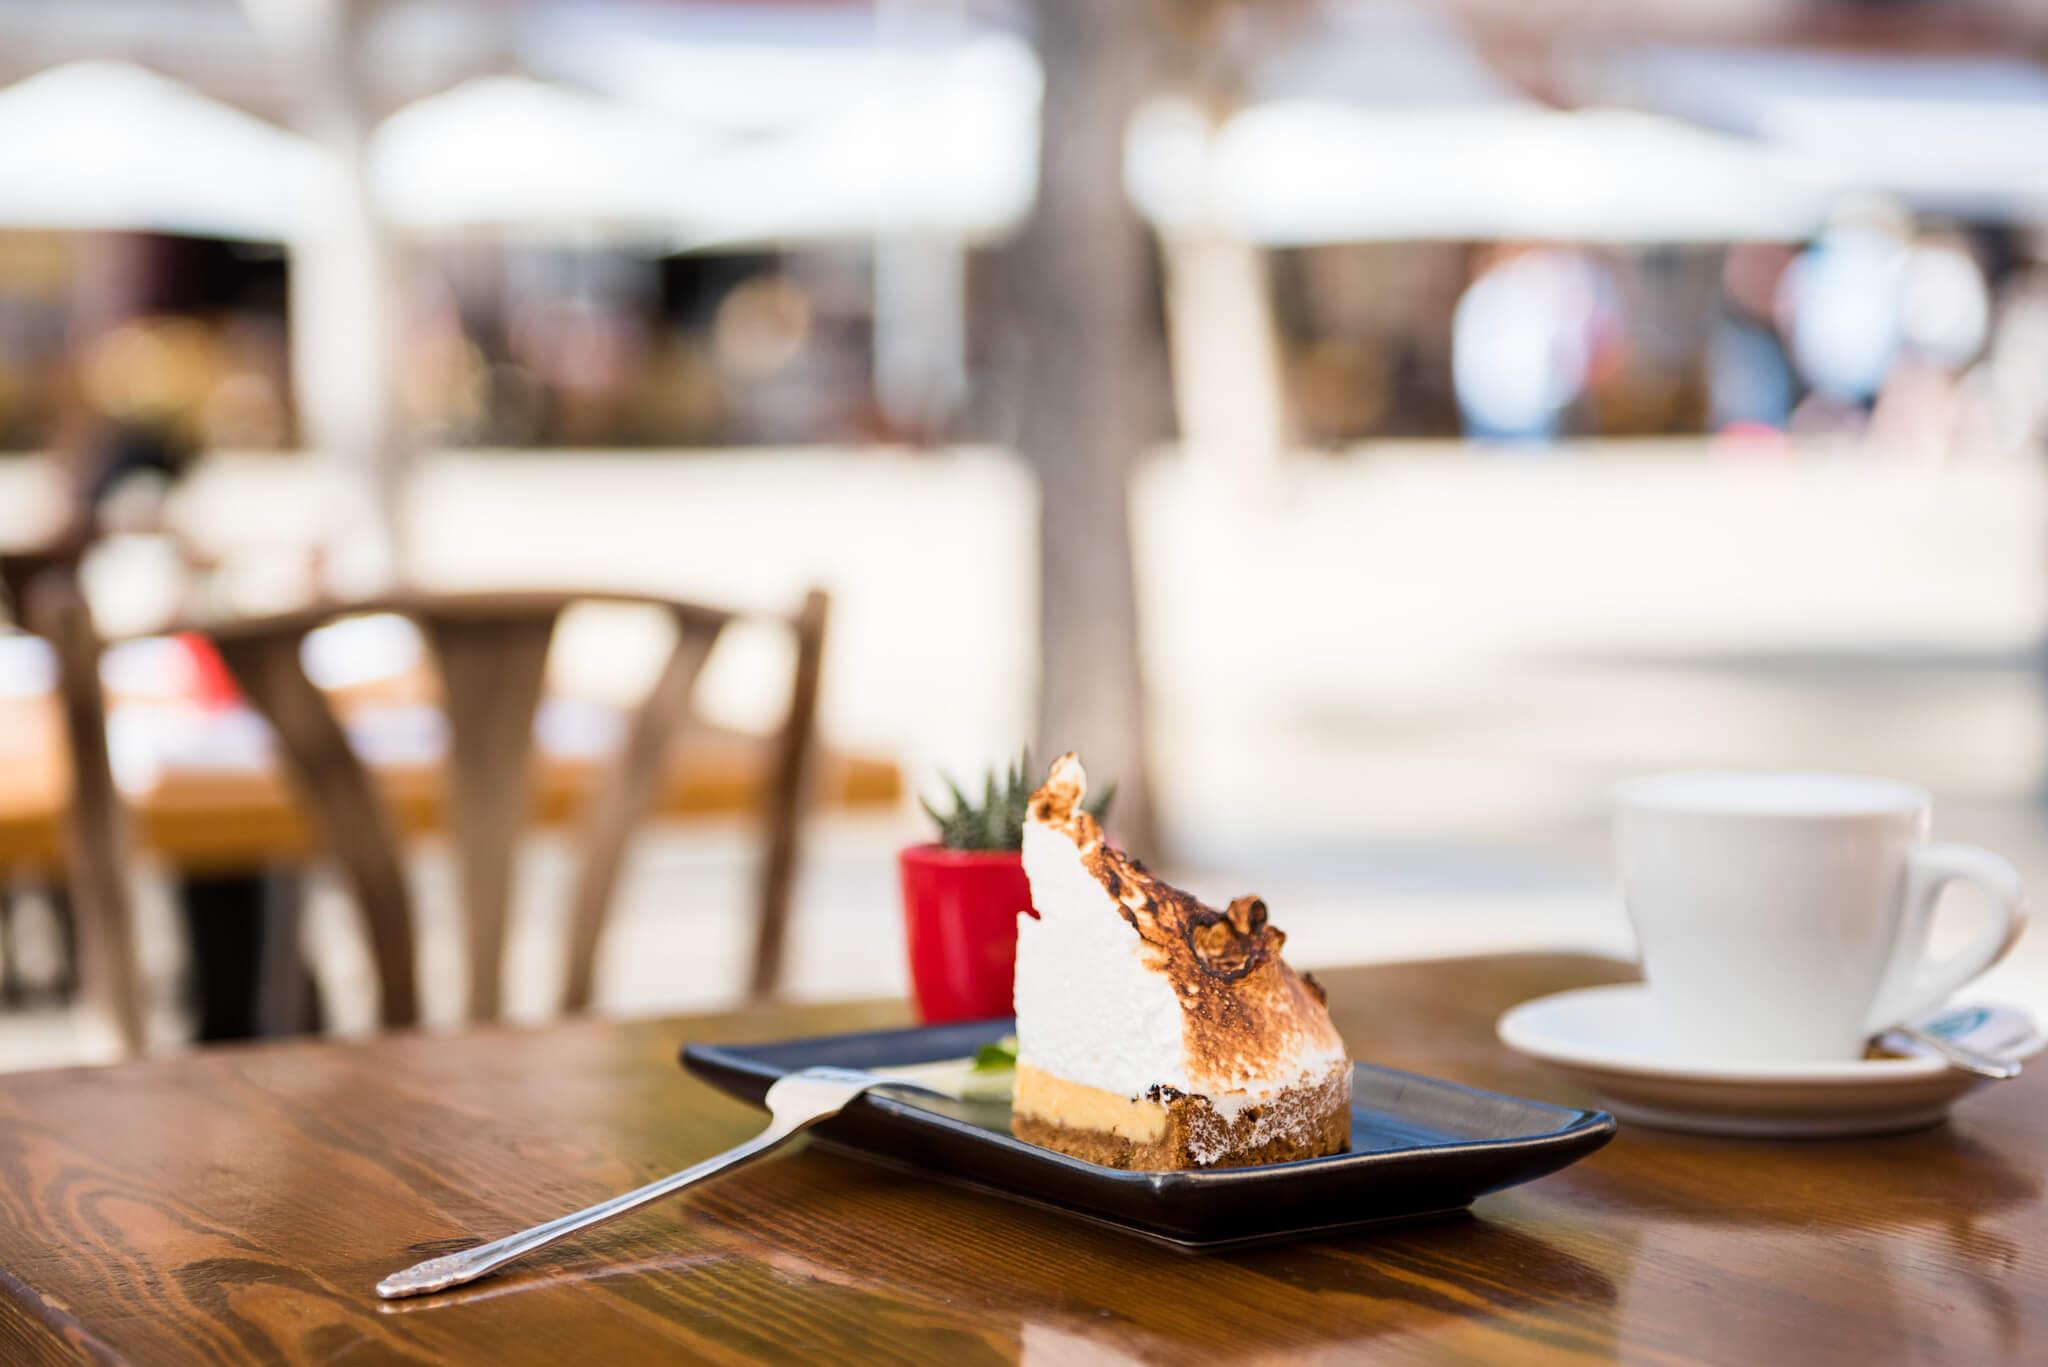 https://www.white-ibiza.com/wp-content/uploads/2020/03/white-ibiza-restaurants-locals-only-2020-02.jpg